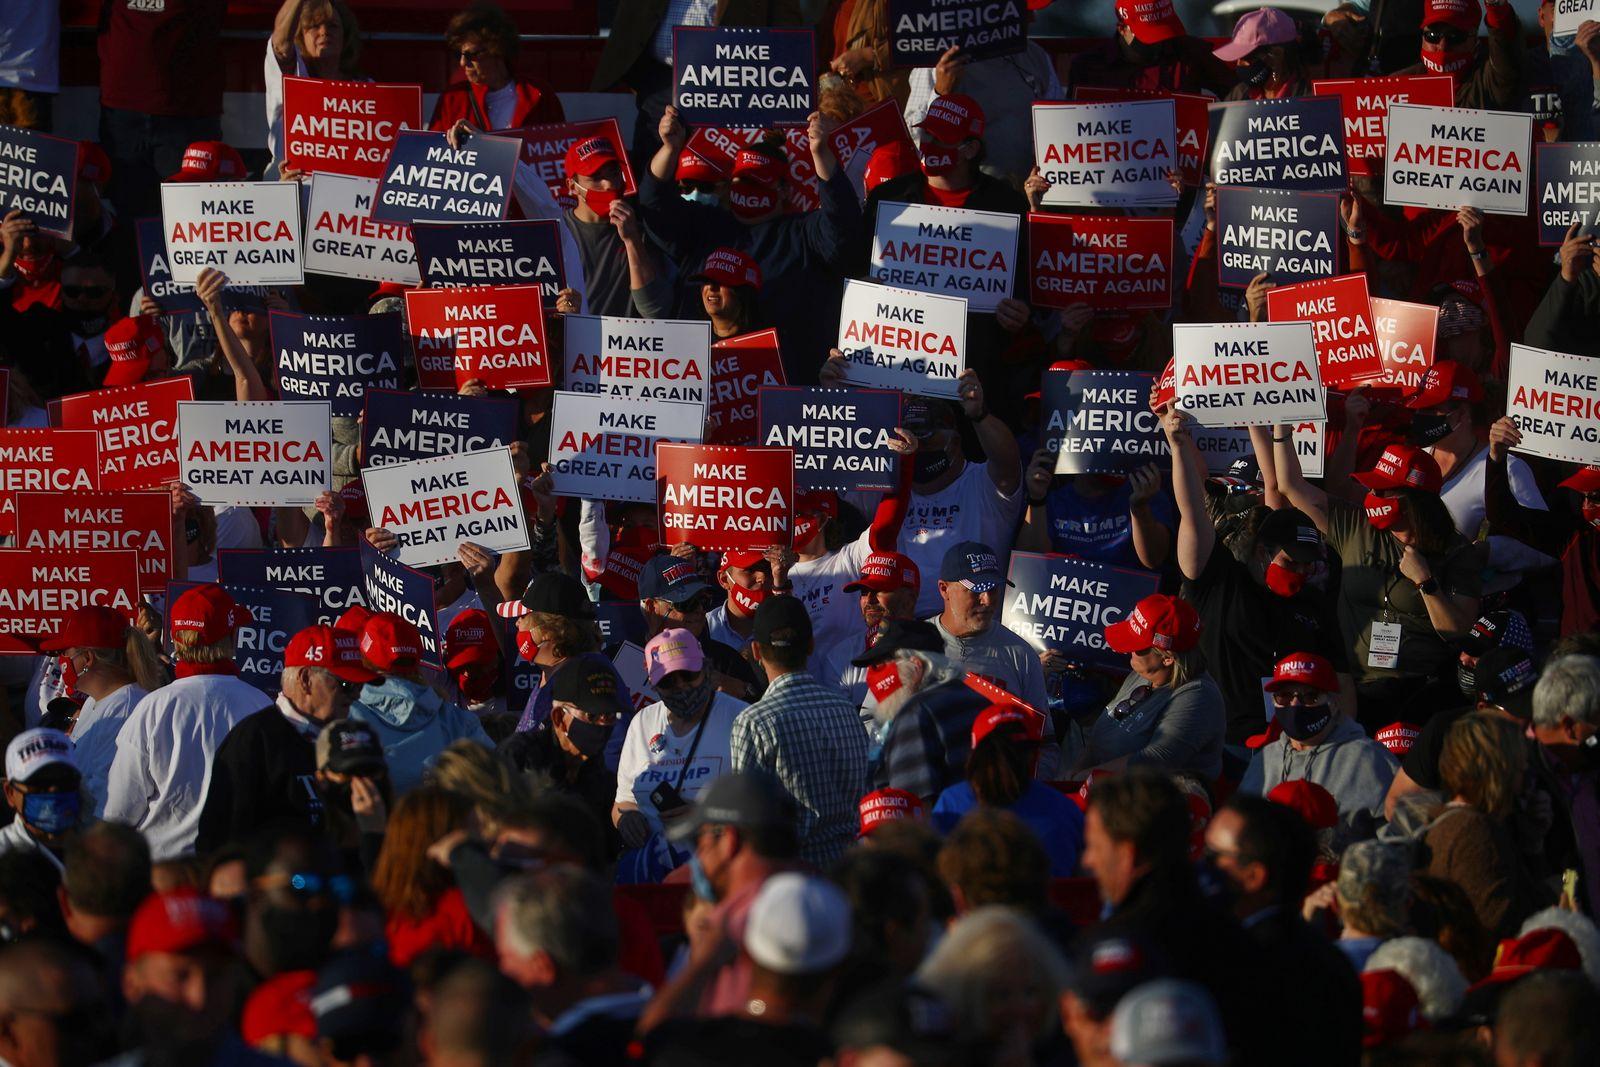 U.S. President Trump holds a rally in Hickory, North Carolina